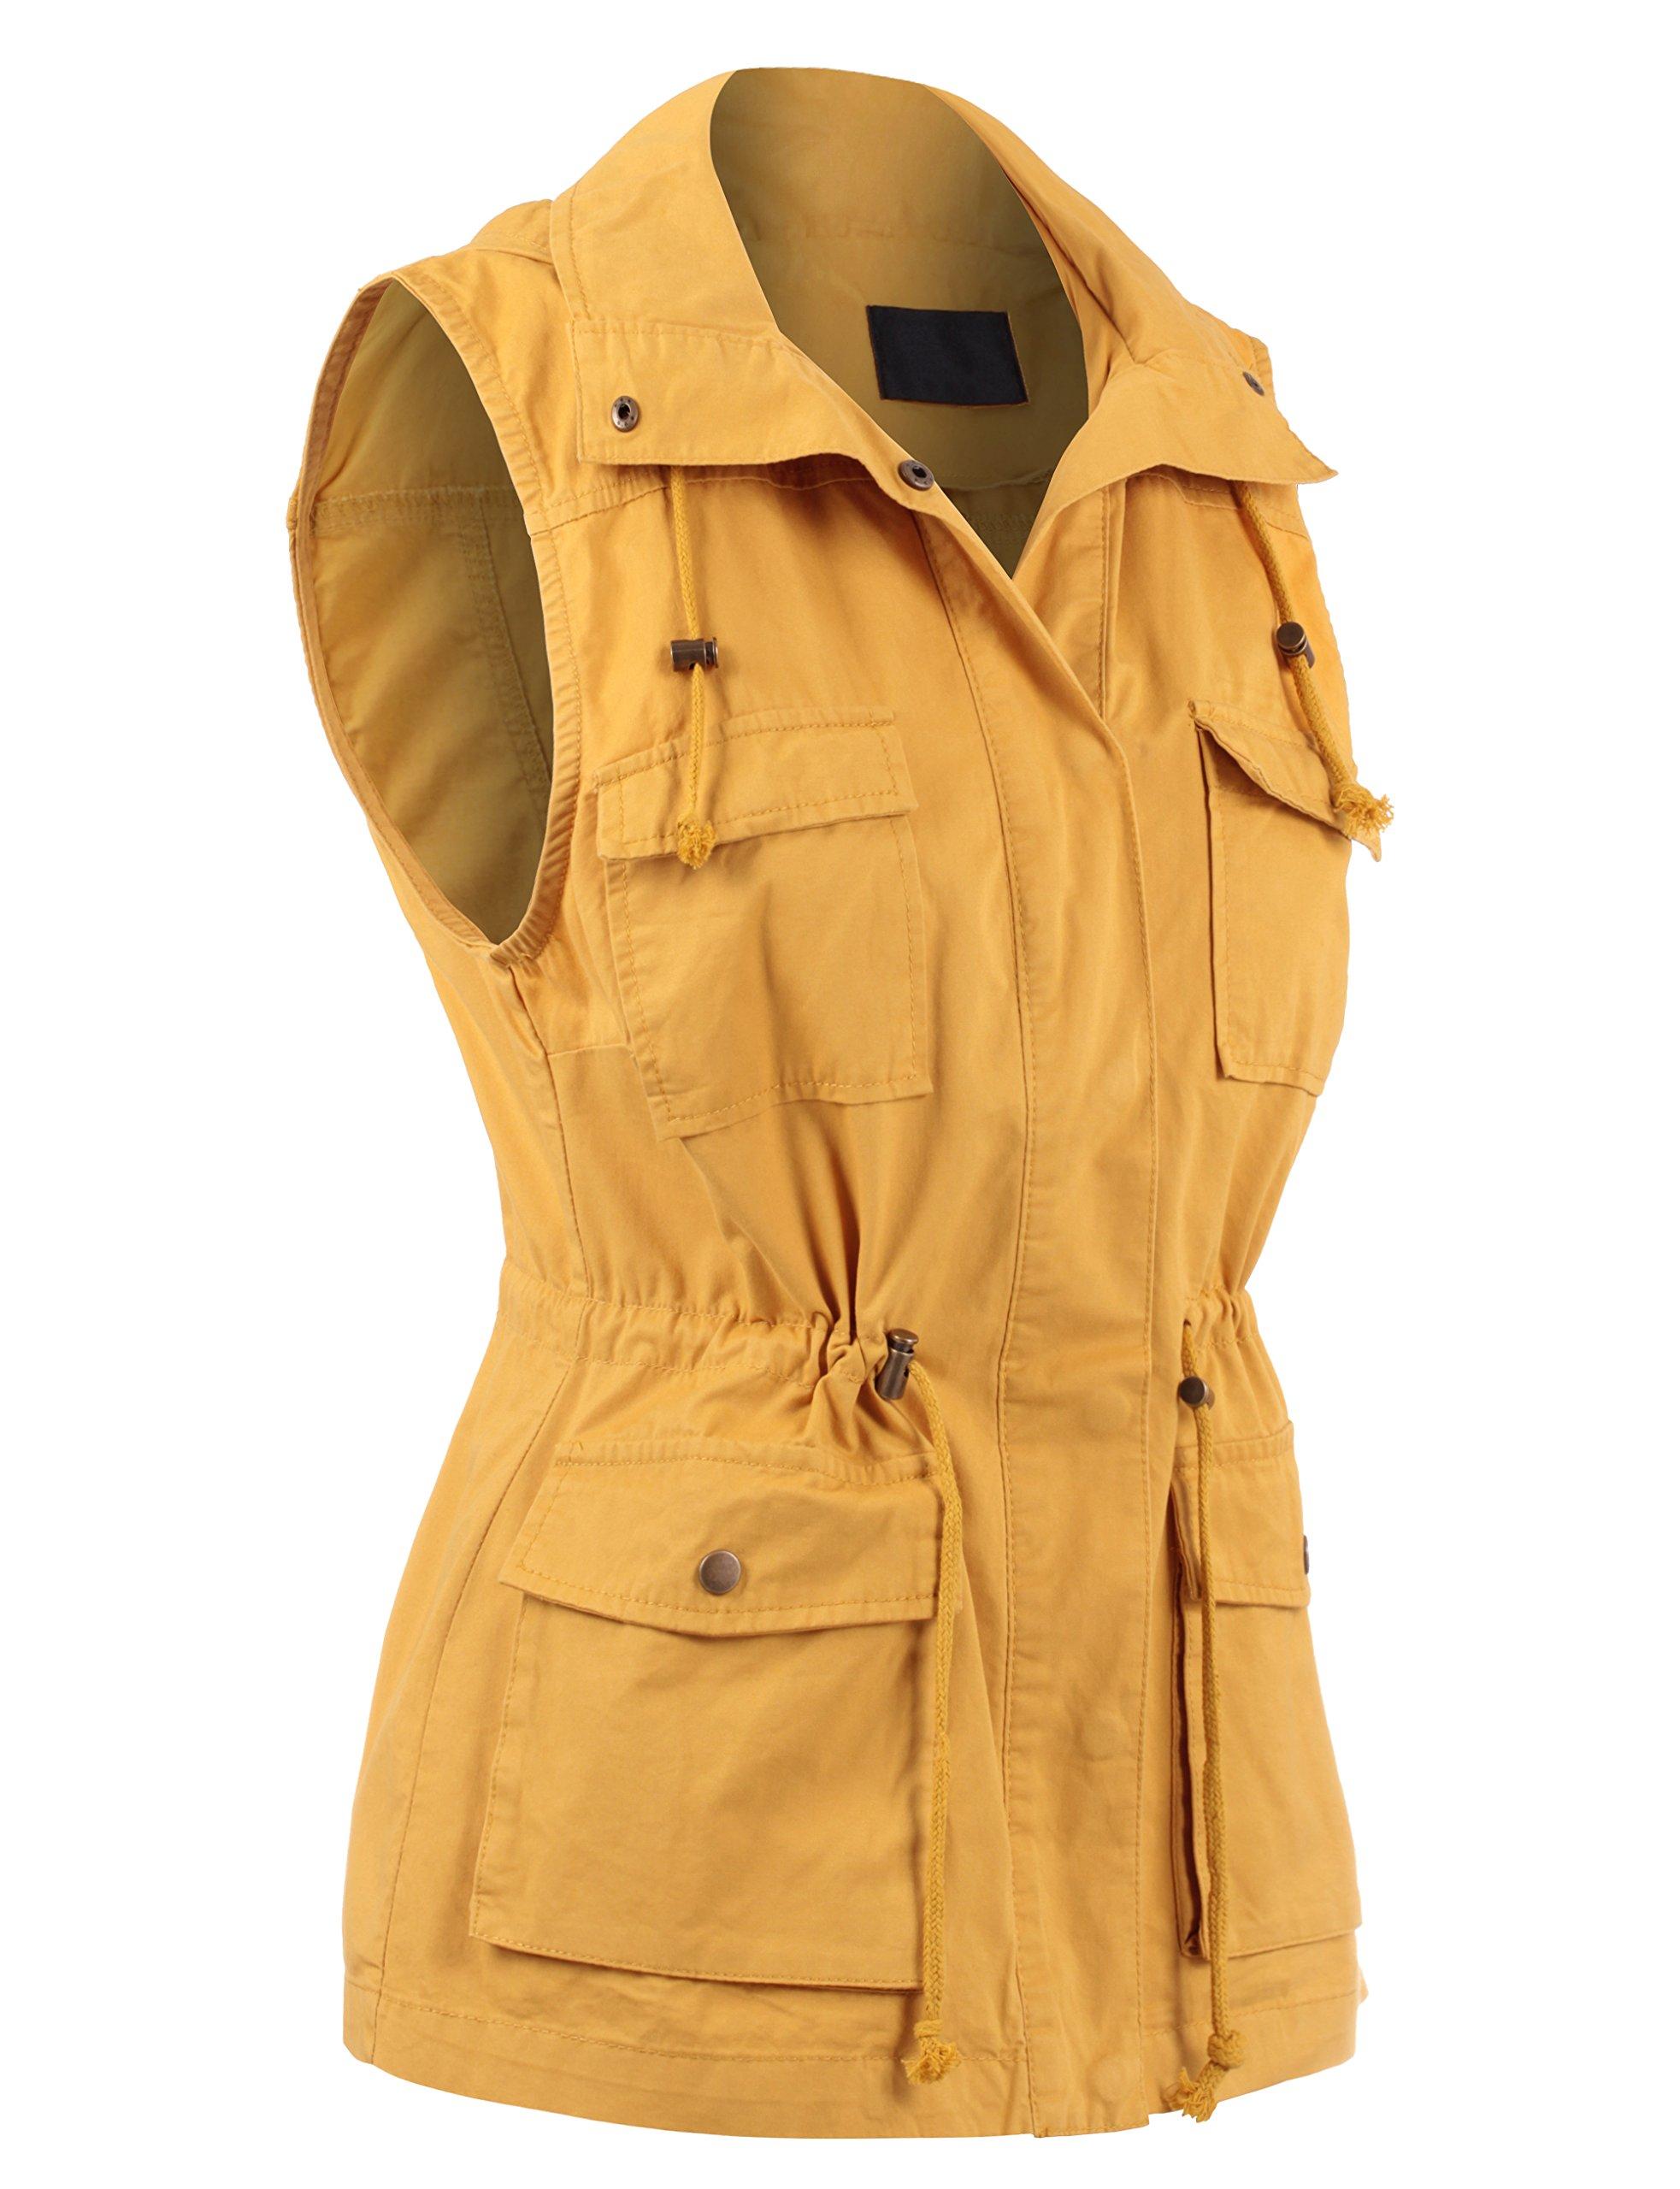 BEKTOME Womens Solid Sleeveless Military Anorak Utility Vest-M-Mustard